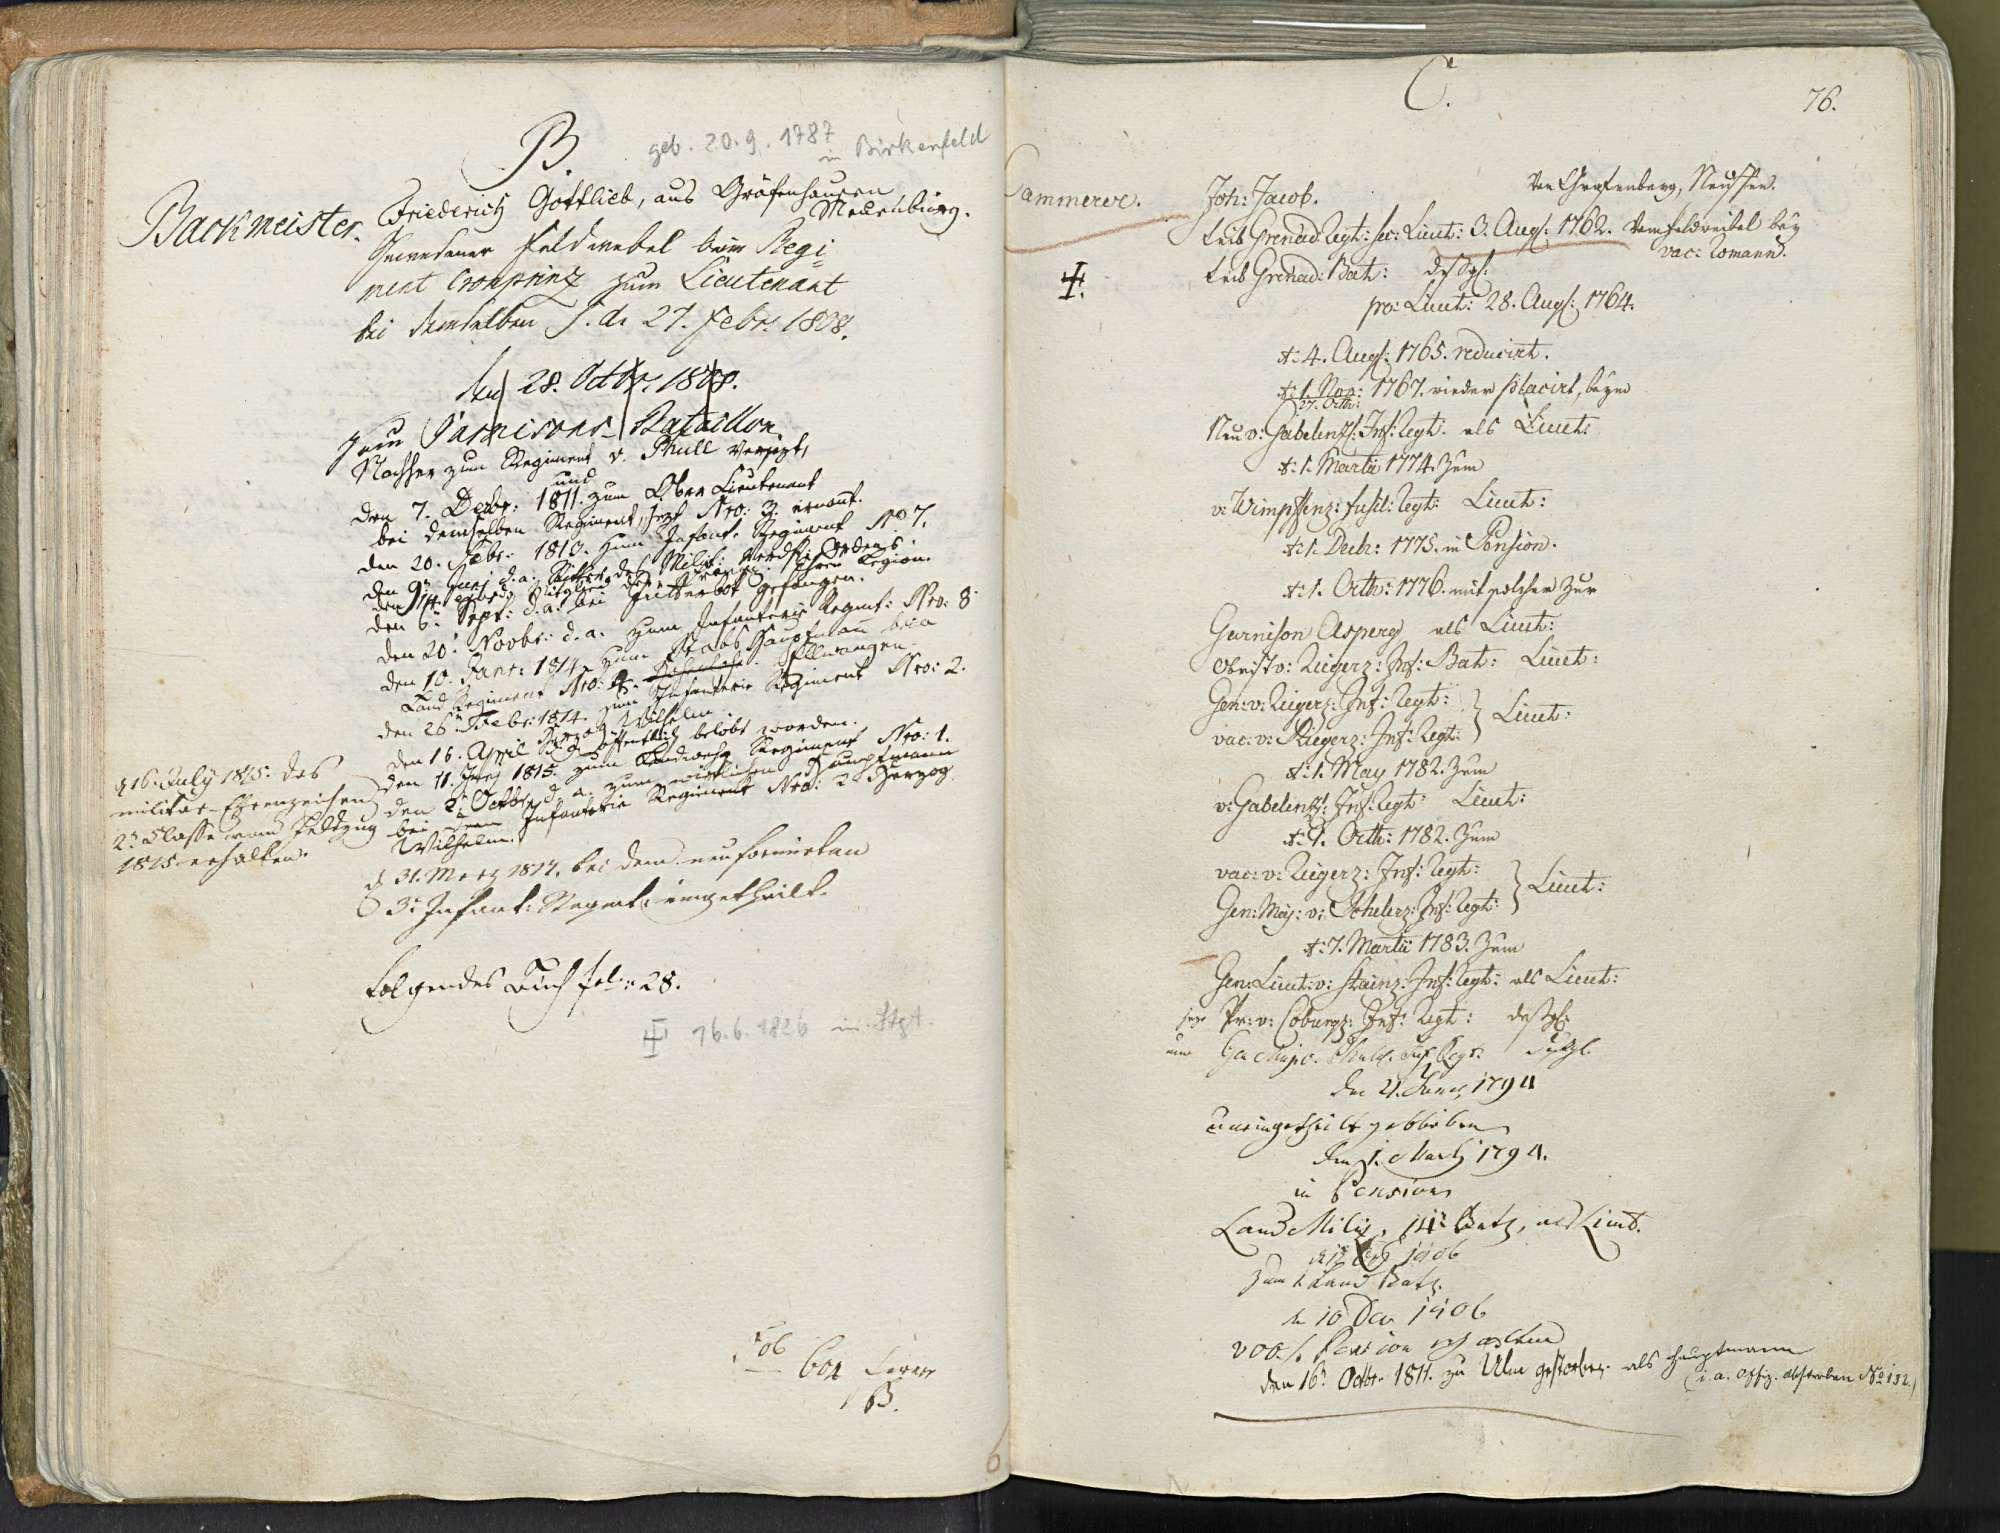 Cammerer, Johann Jacob, Bild 1